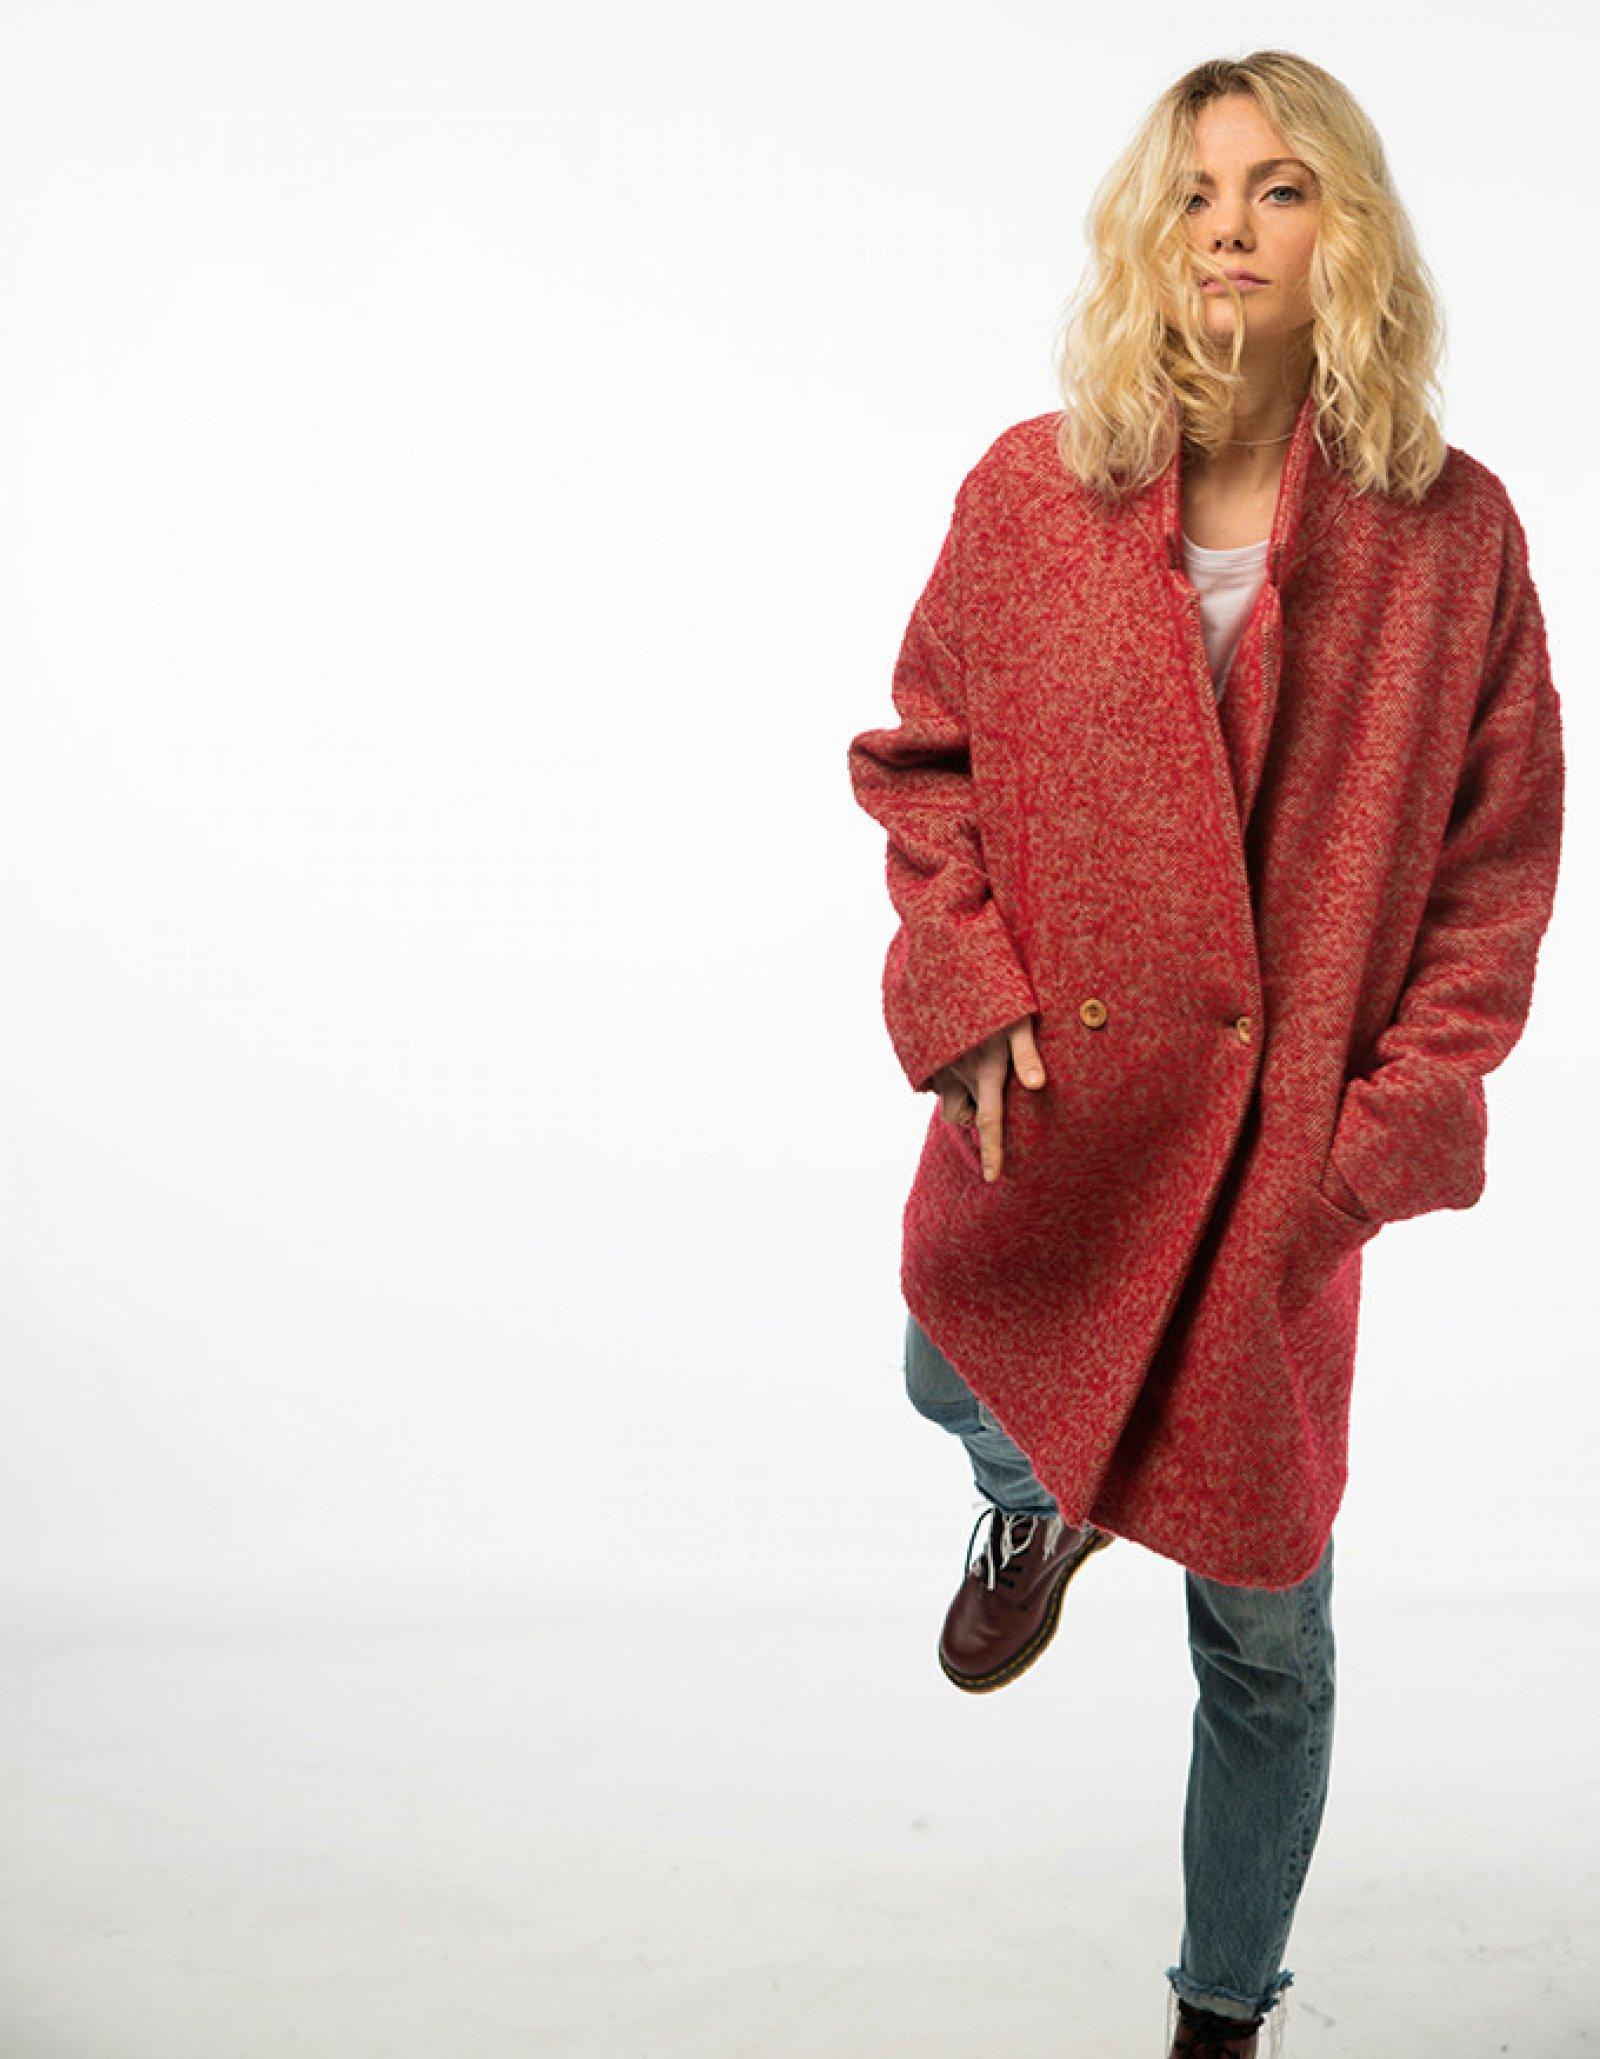 Abrigo Mikal de Ewan Clothing, rebajado a 175 euros